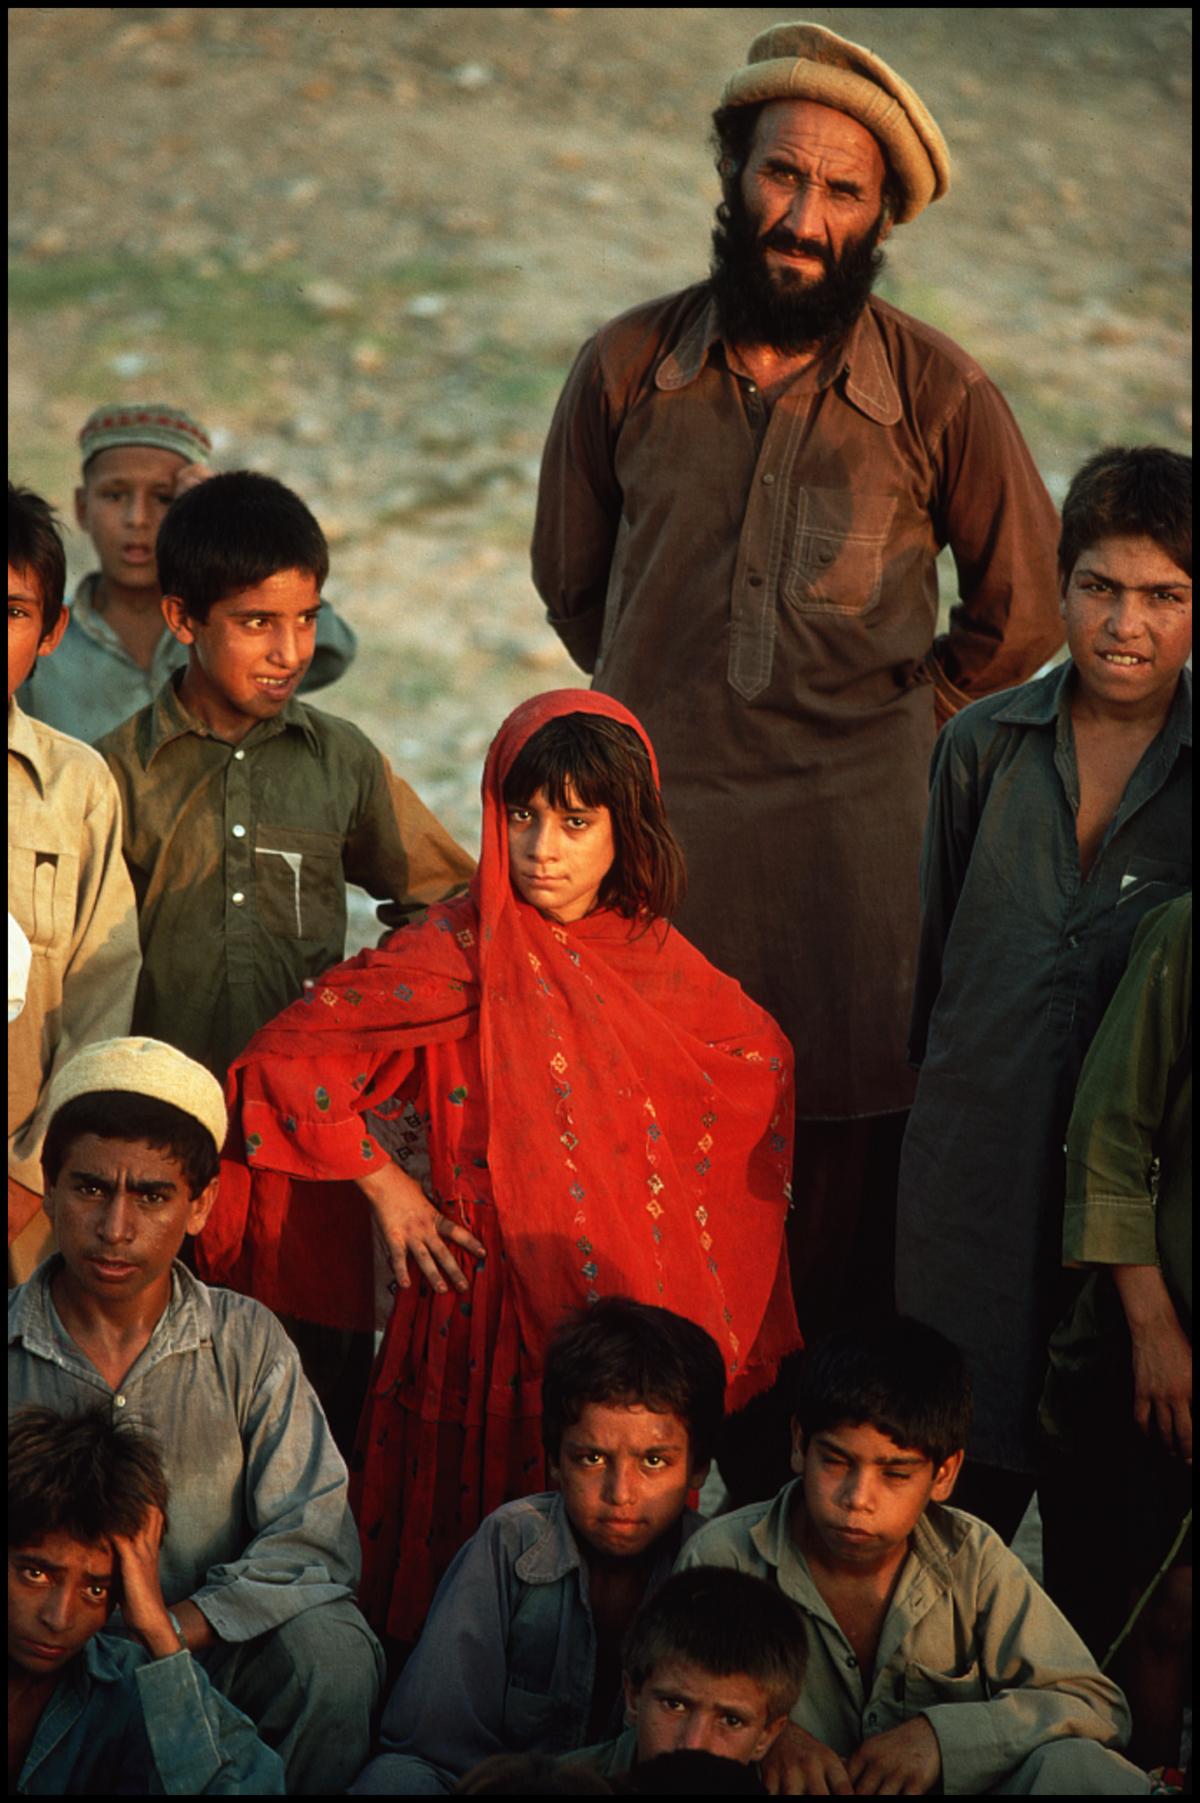 January 1989, Peshawar, Pakistan --- Afghan Refugees in Pakistan